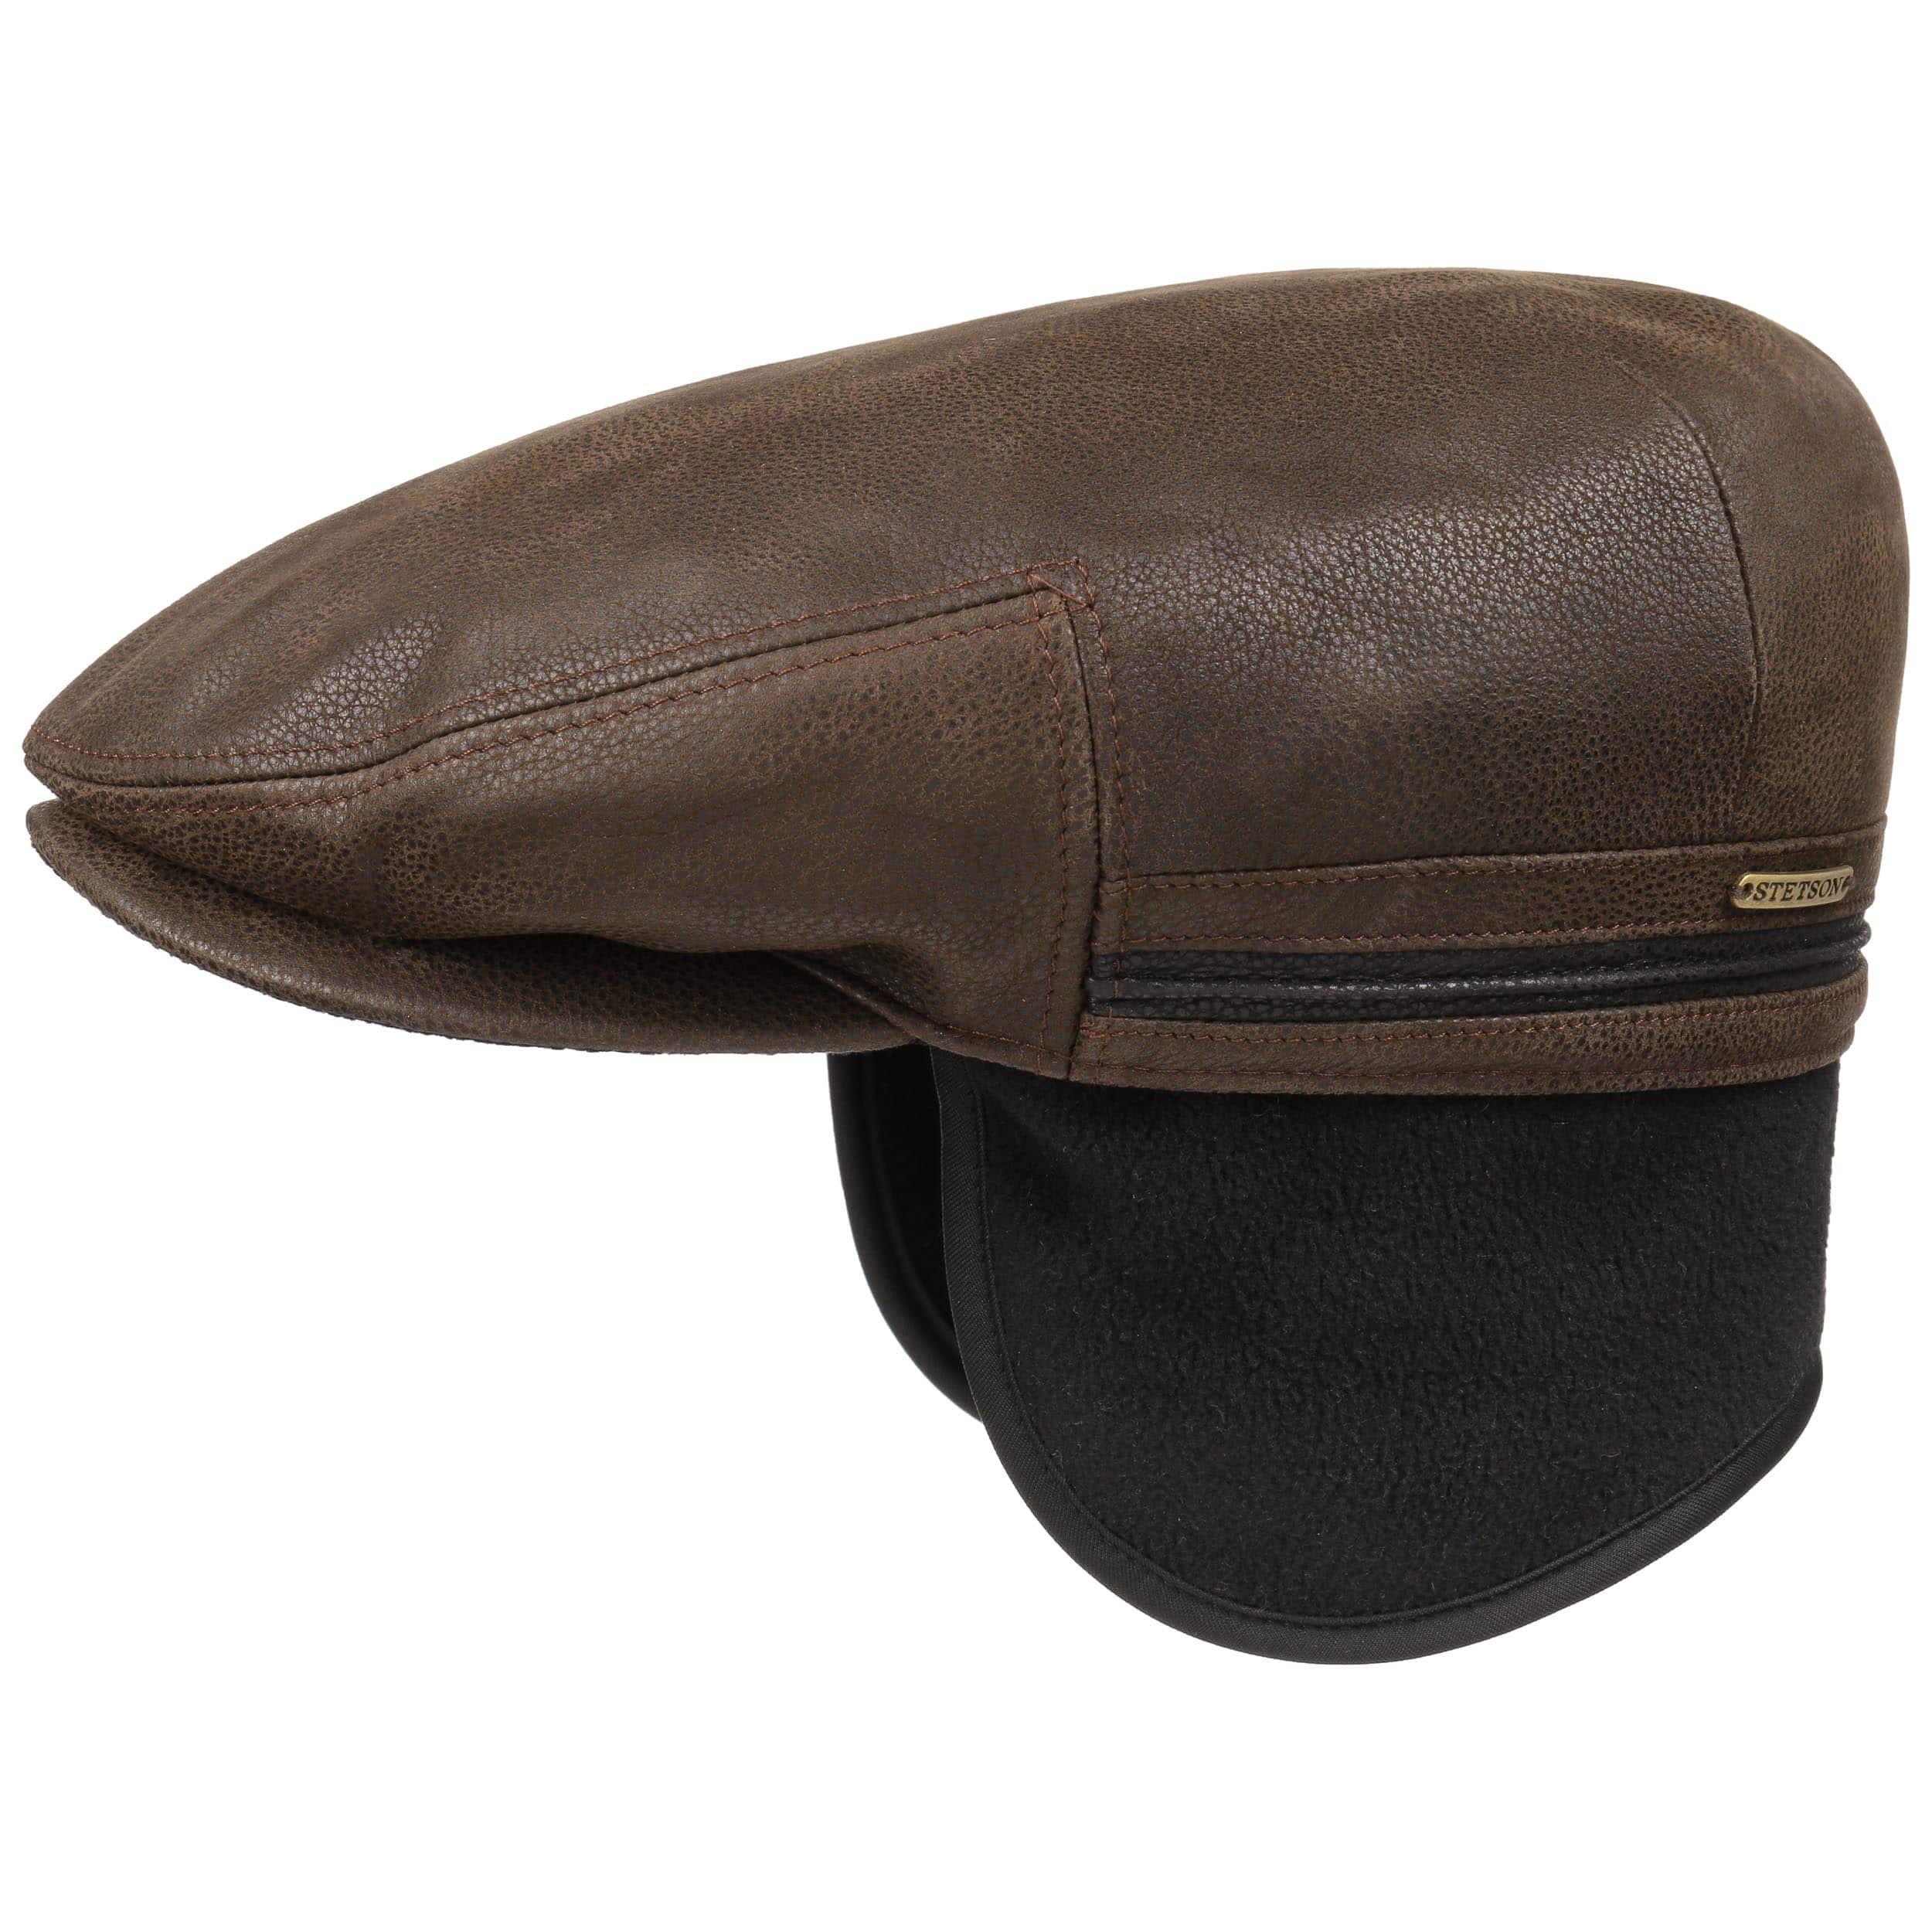 735fceea5 Kent Earflaps Leather Flat Cap by Stetson